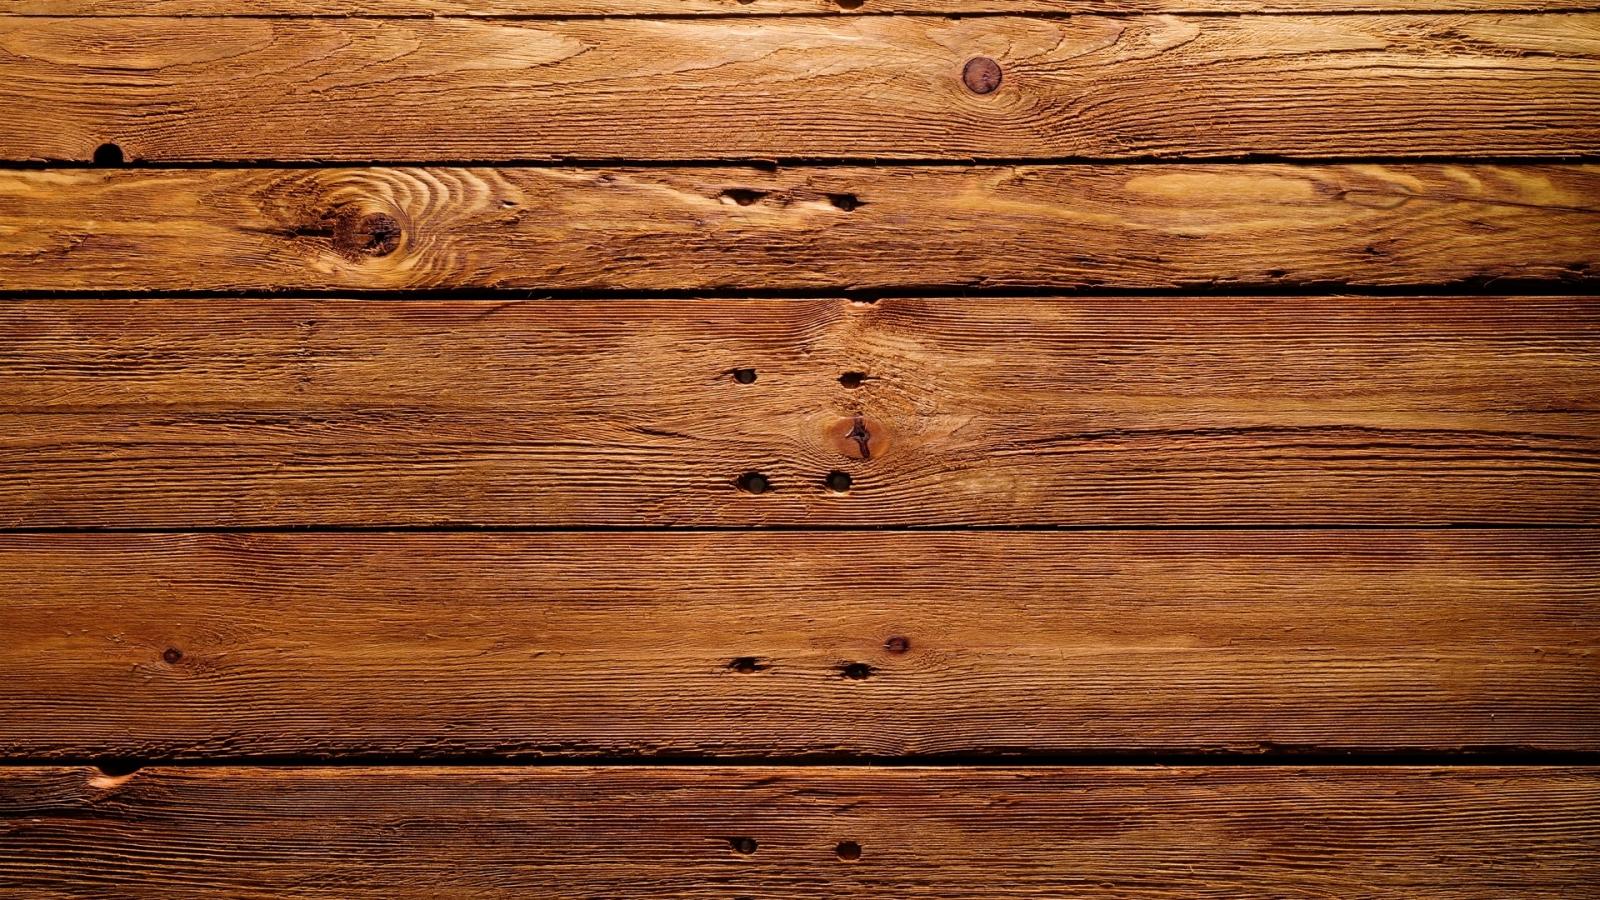 Textura tablas de madera hd 1600x900 - imagenes - wallpapers gratis